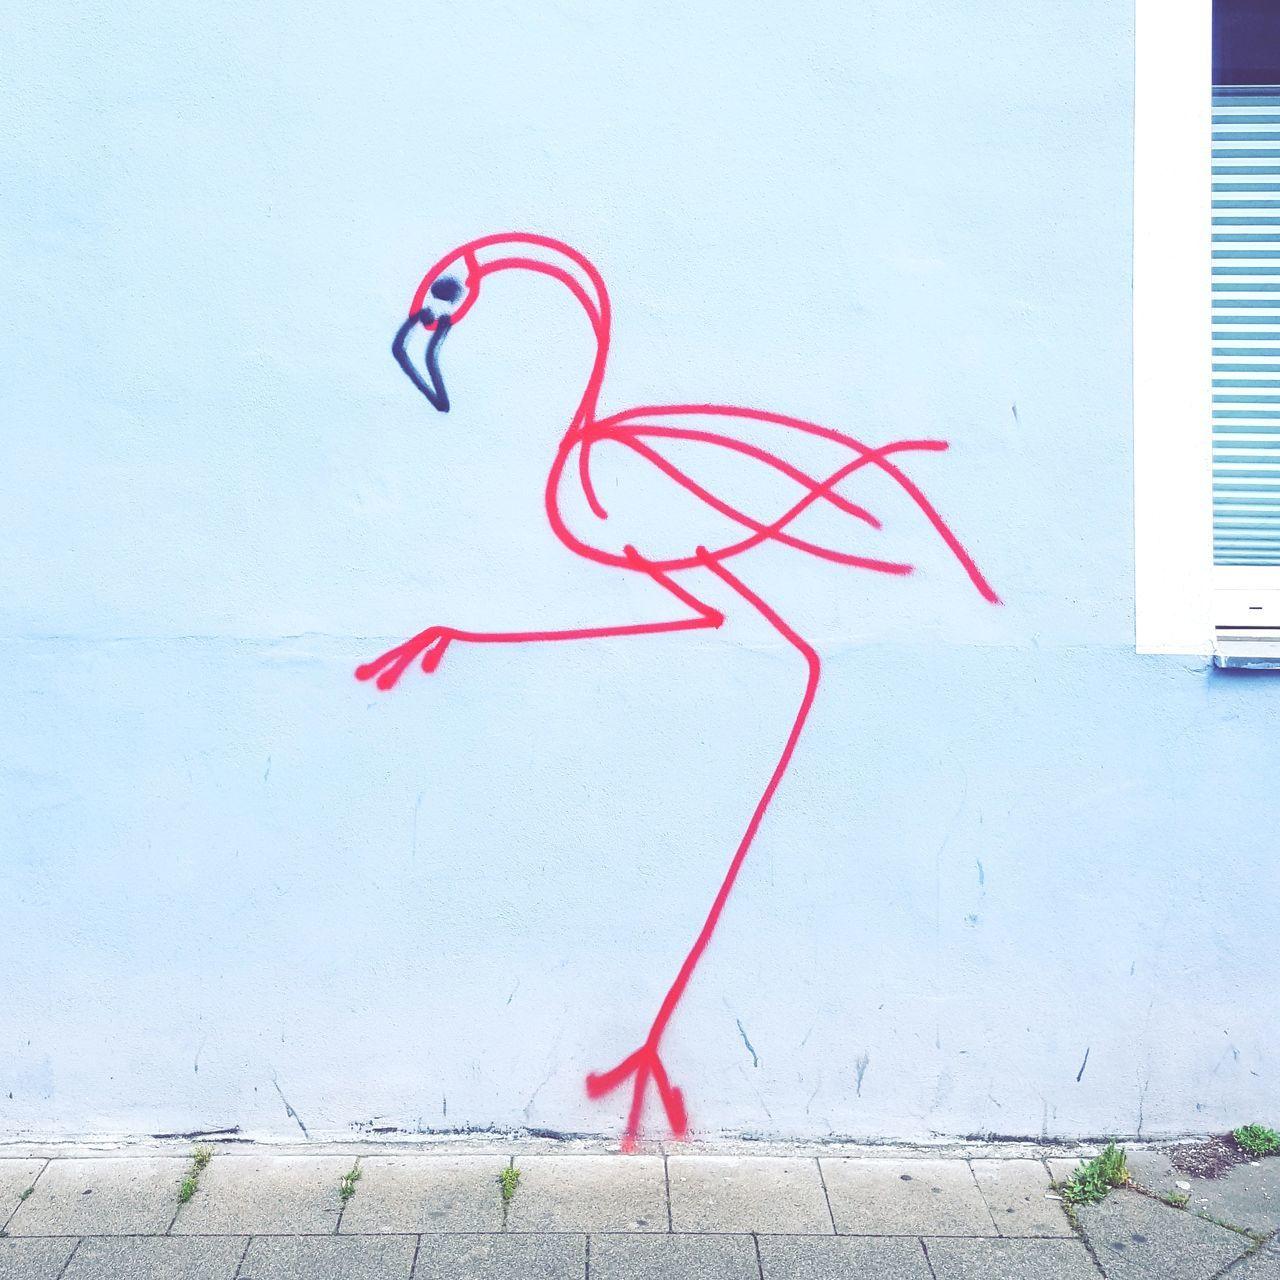 Flamingolove. Creativity Day No People Outdoors Streetart Streetphotography Flamingo Simplicity Pink Wall Building Exterior The Street Photographer - 2017 EyeEm Awards